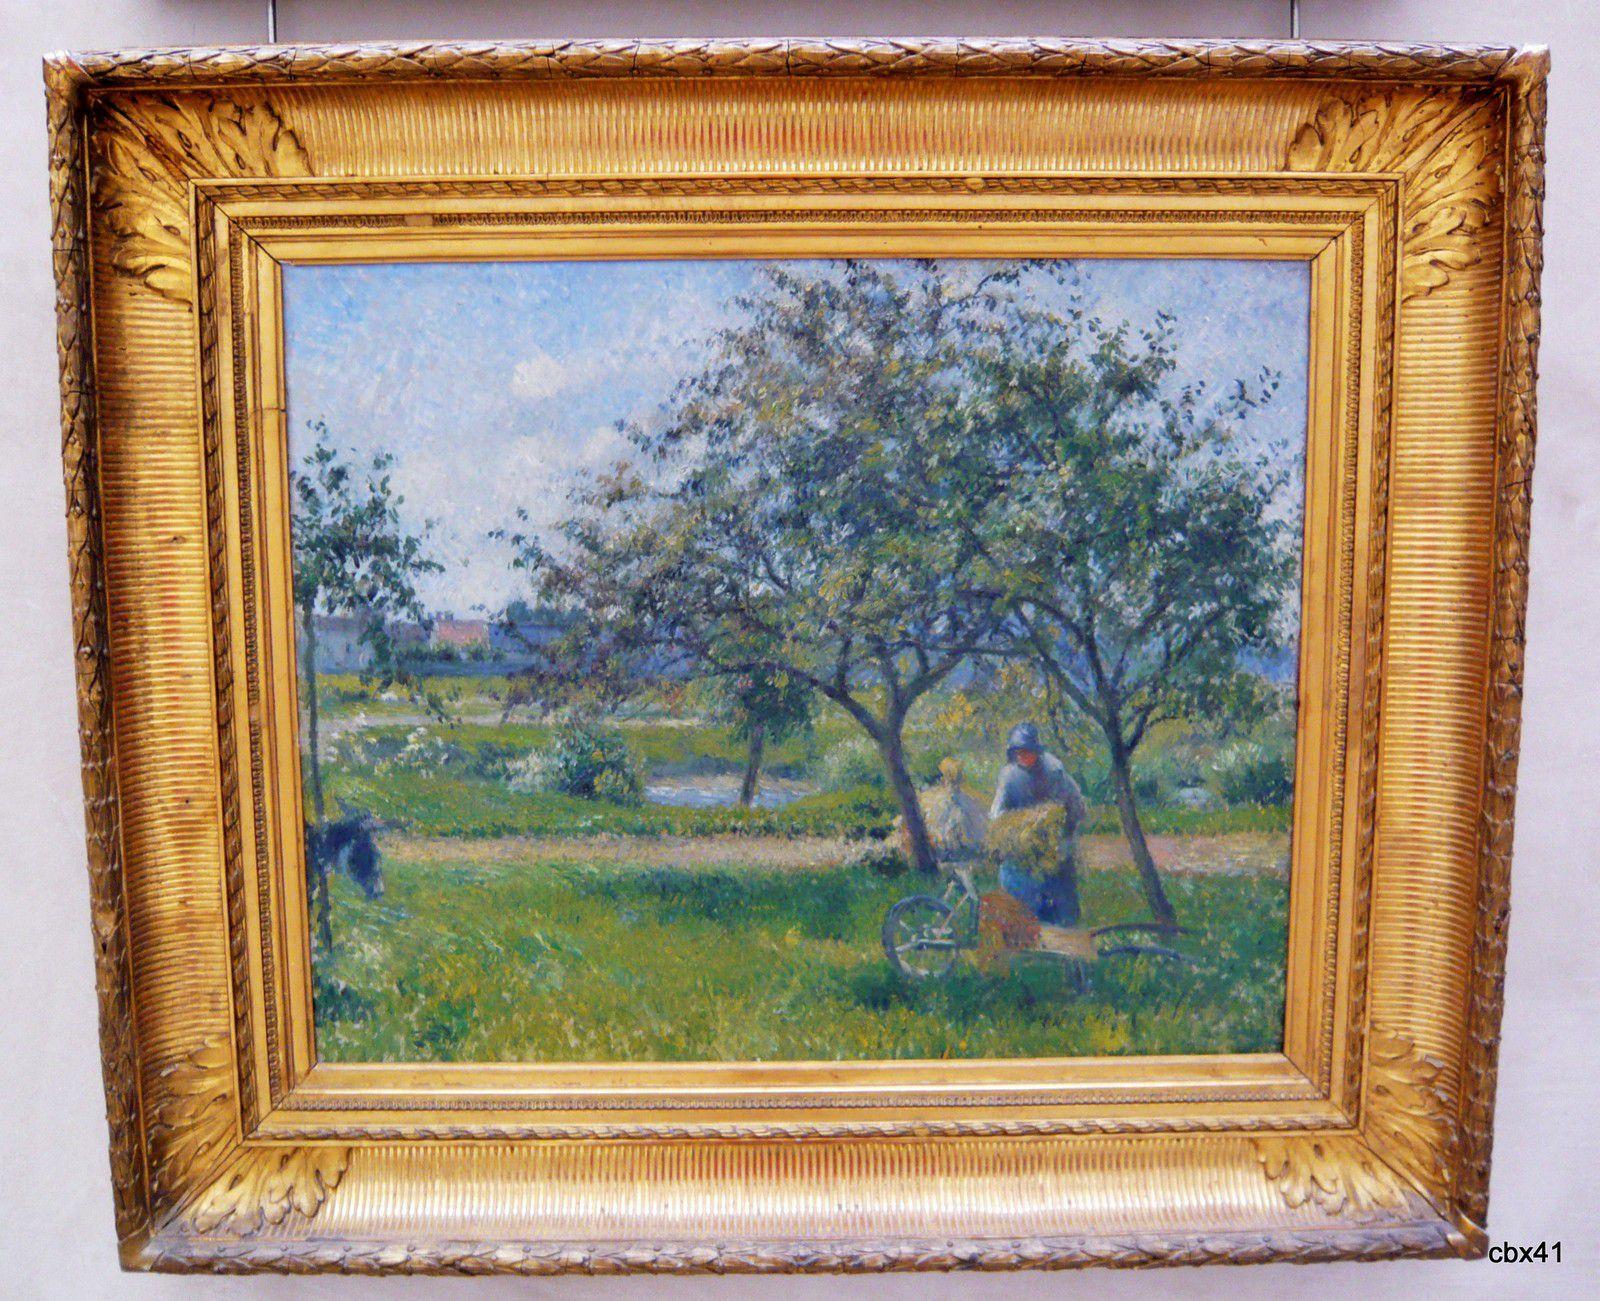 Camille Pissaro, La brouette (verger)